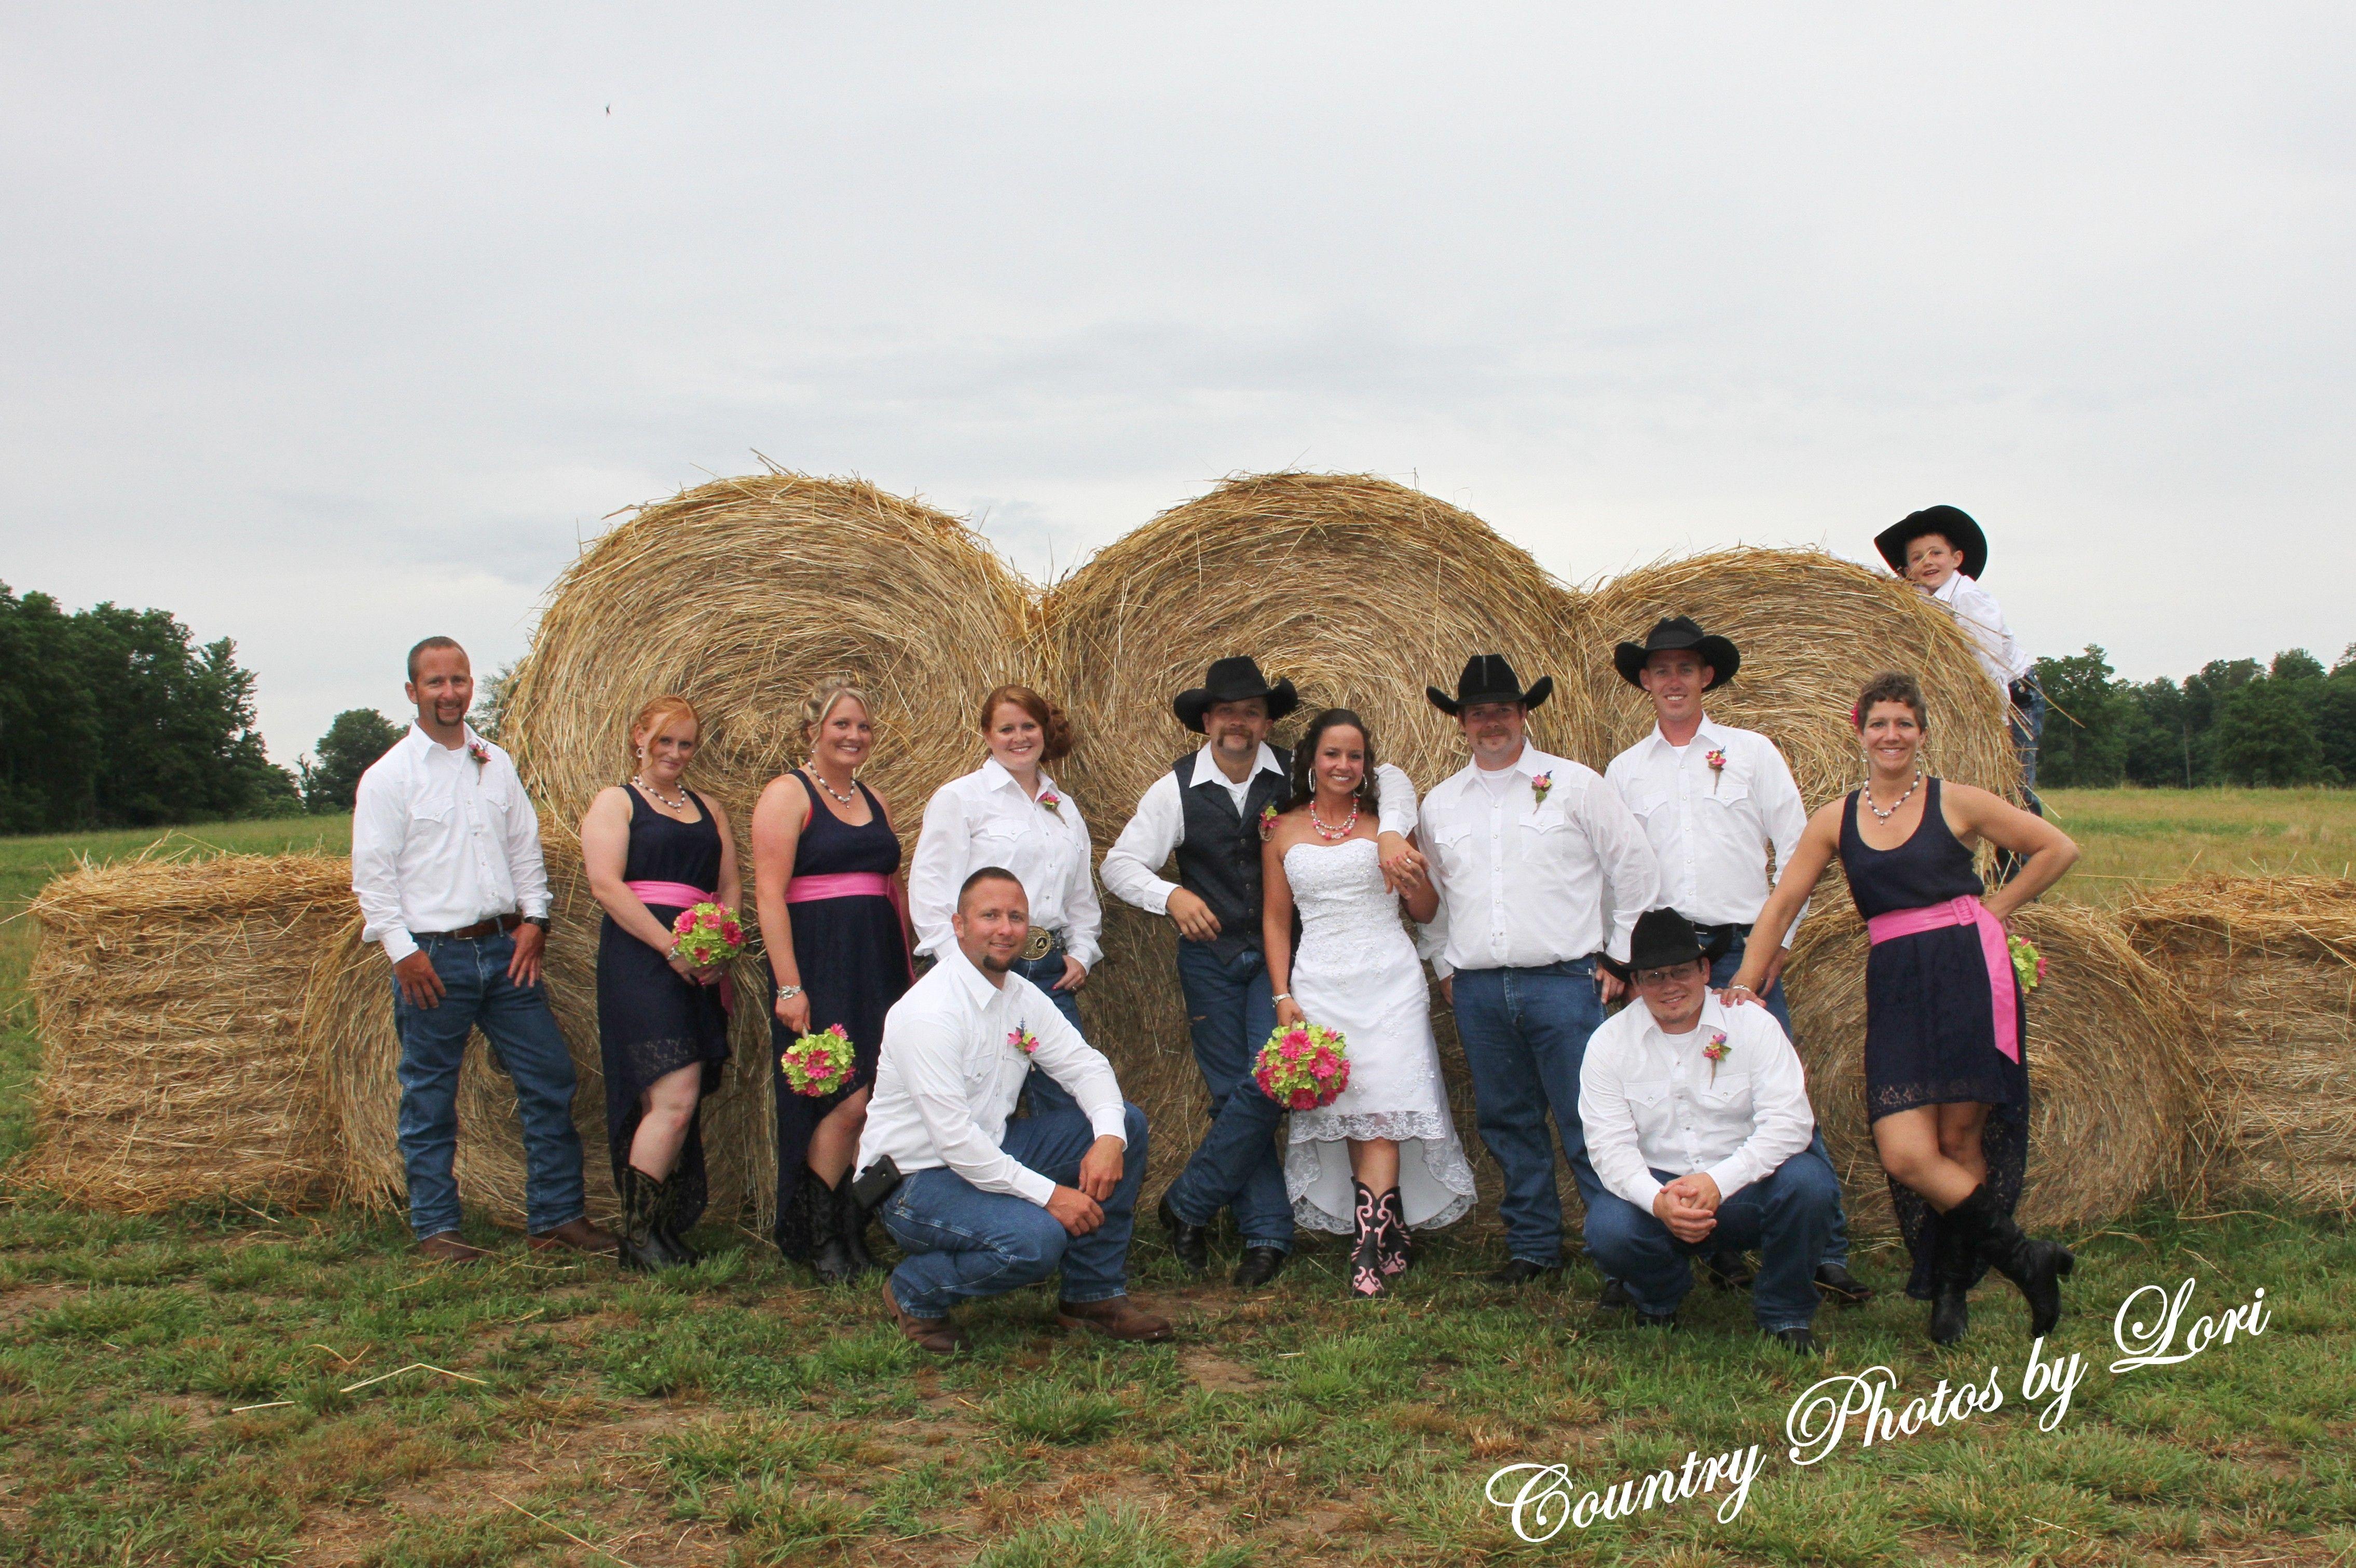 Backyard Western Wedding Ideas : Pin by Jennifer Johnson on Outdoor Western Wedding Ideas  Pinterest